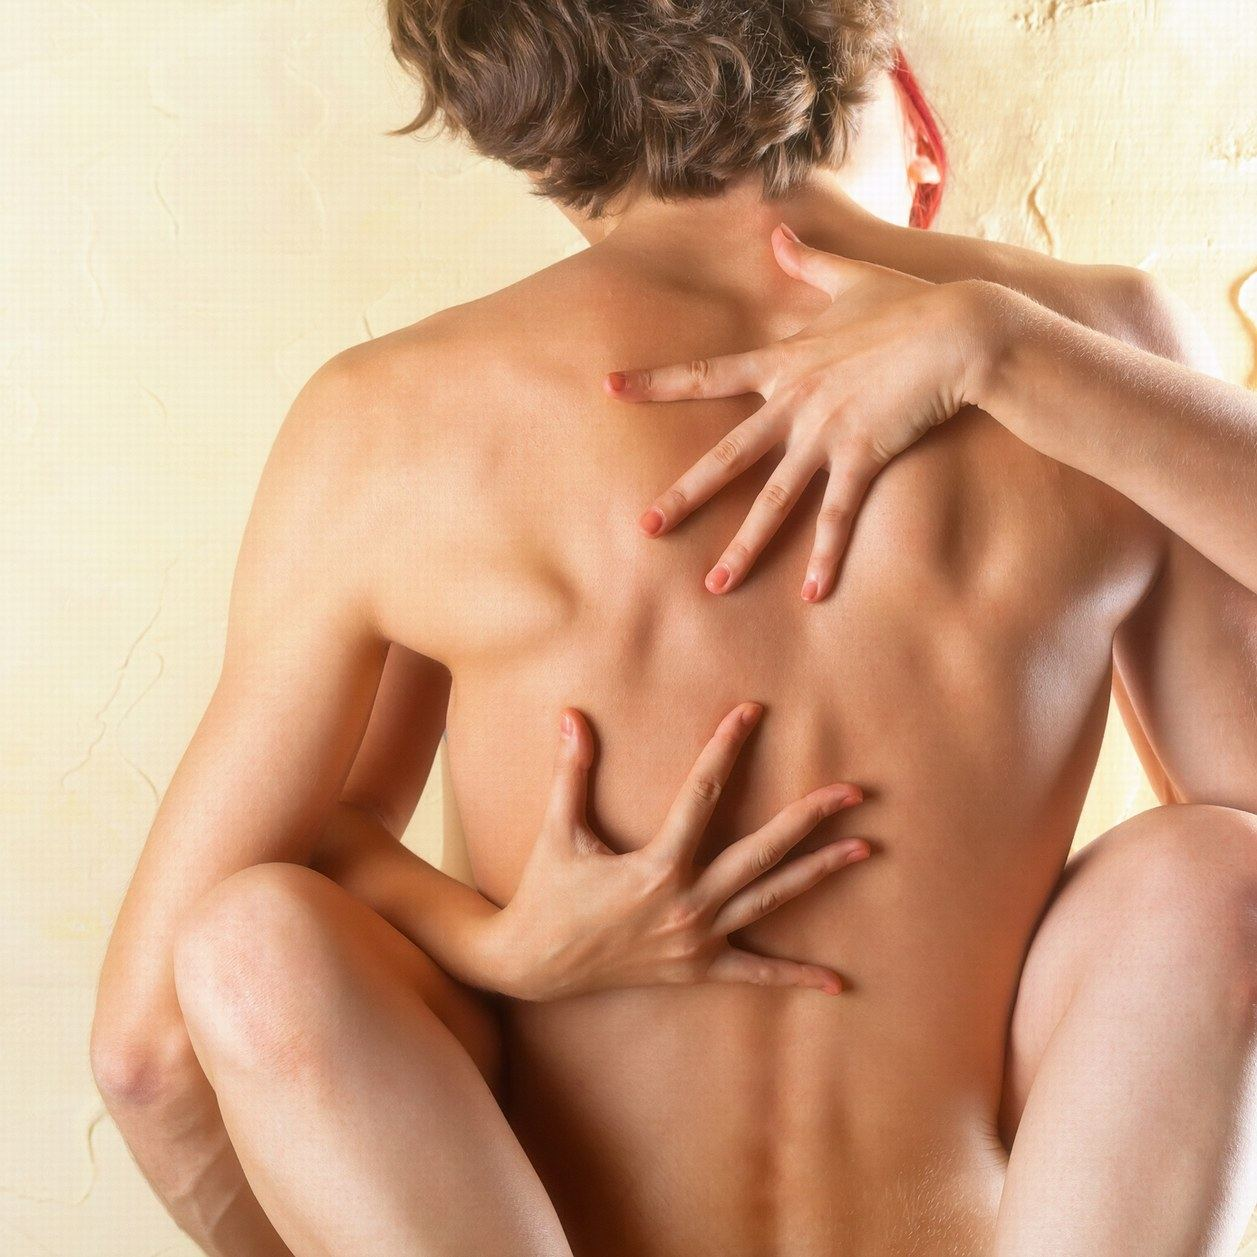 Imagenes de poses haciendo el amor [PUNIQRANDLINE-(au-dating-names.txt) 61